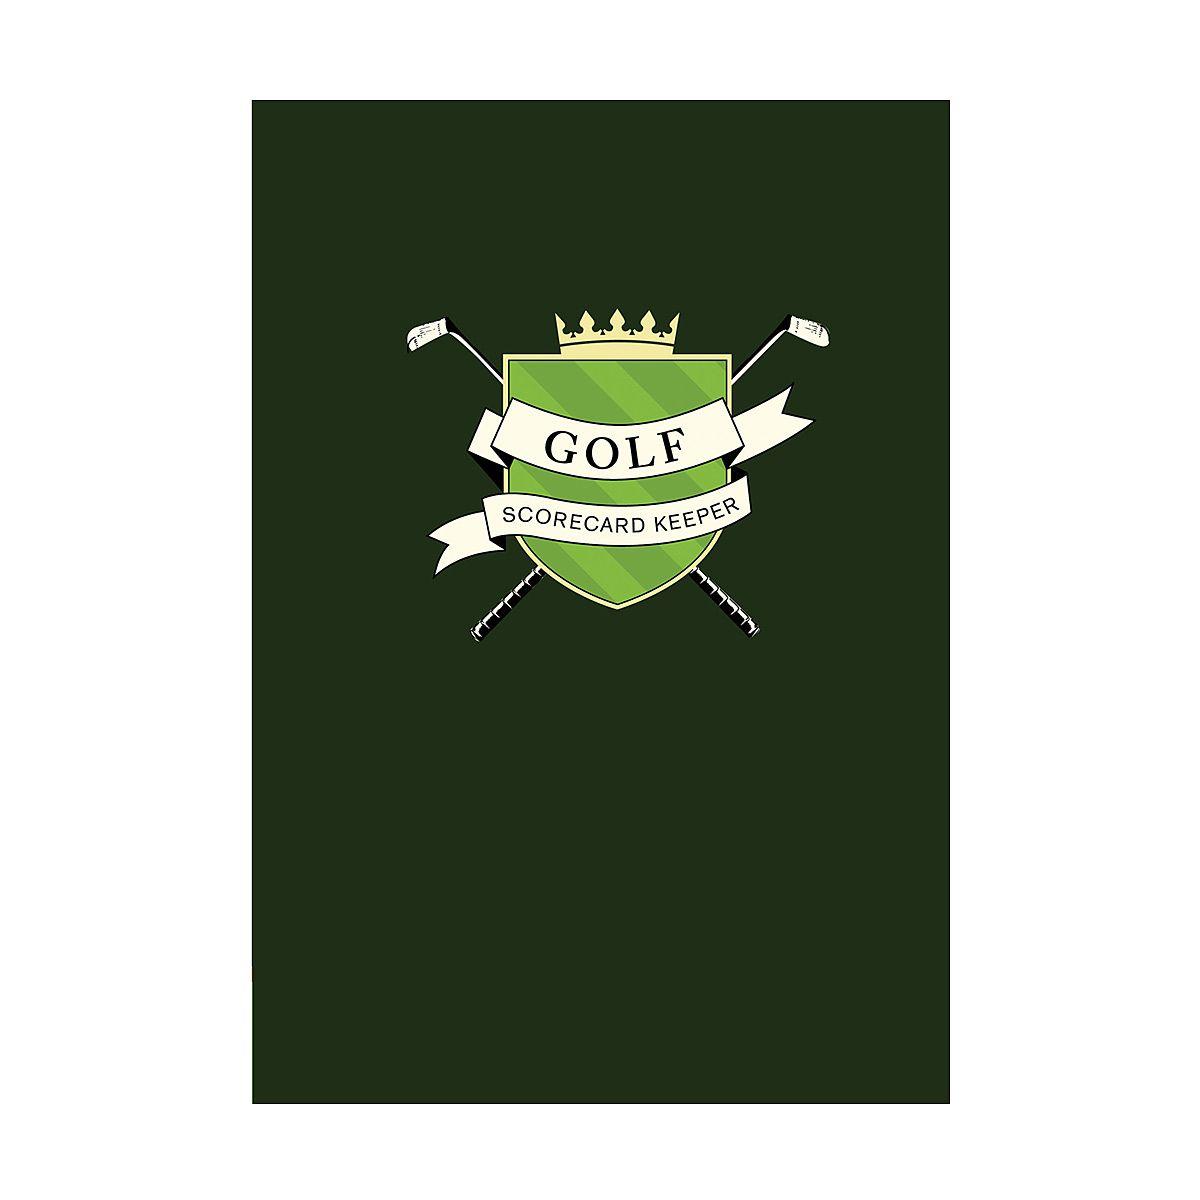 Golfs, Golfer, Golfing, Score